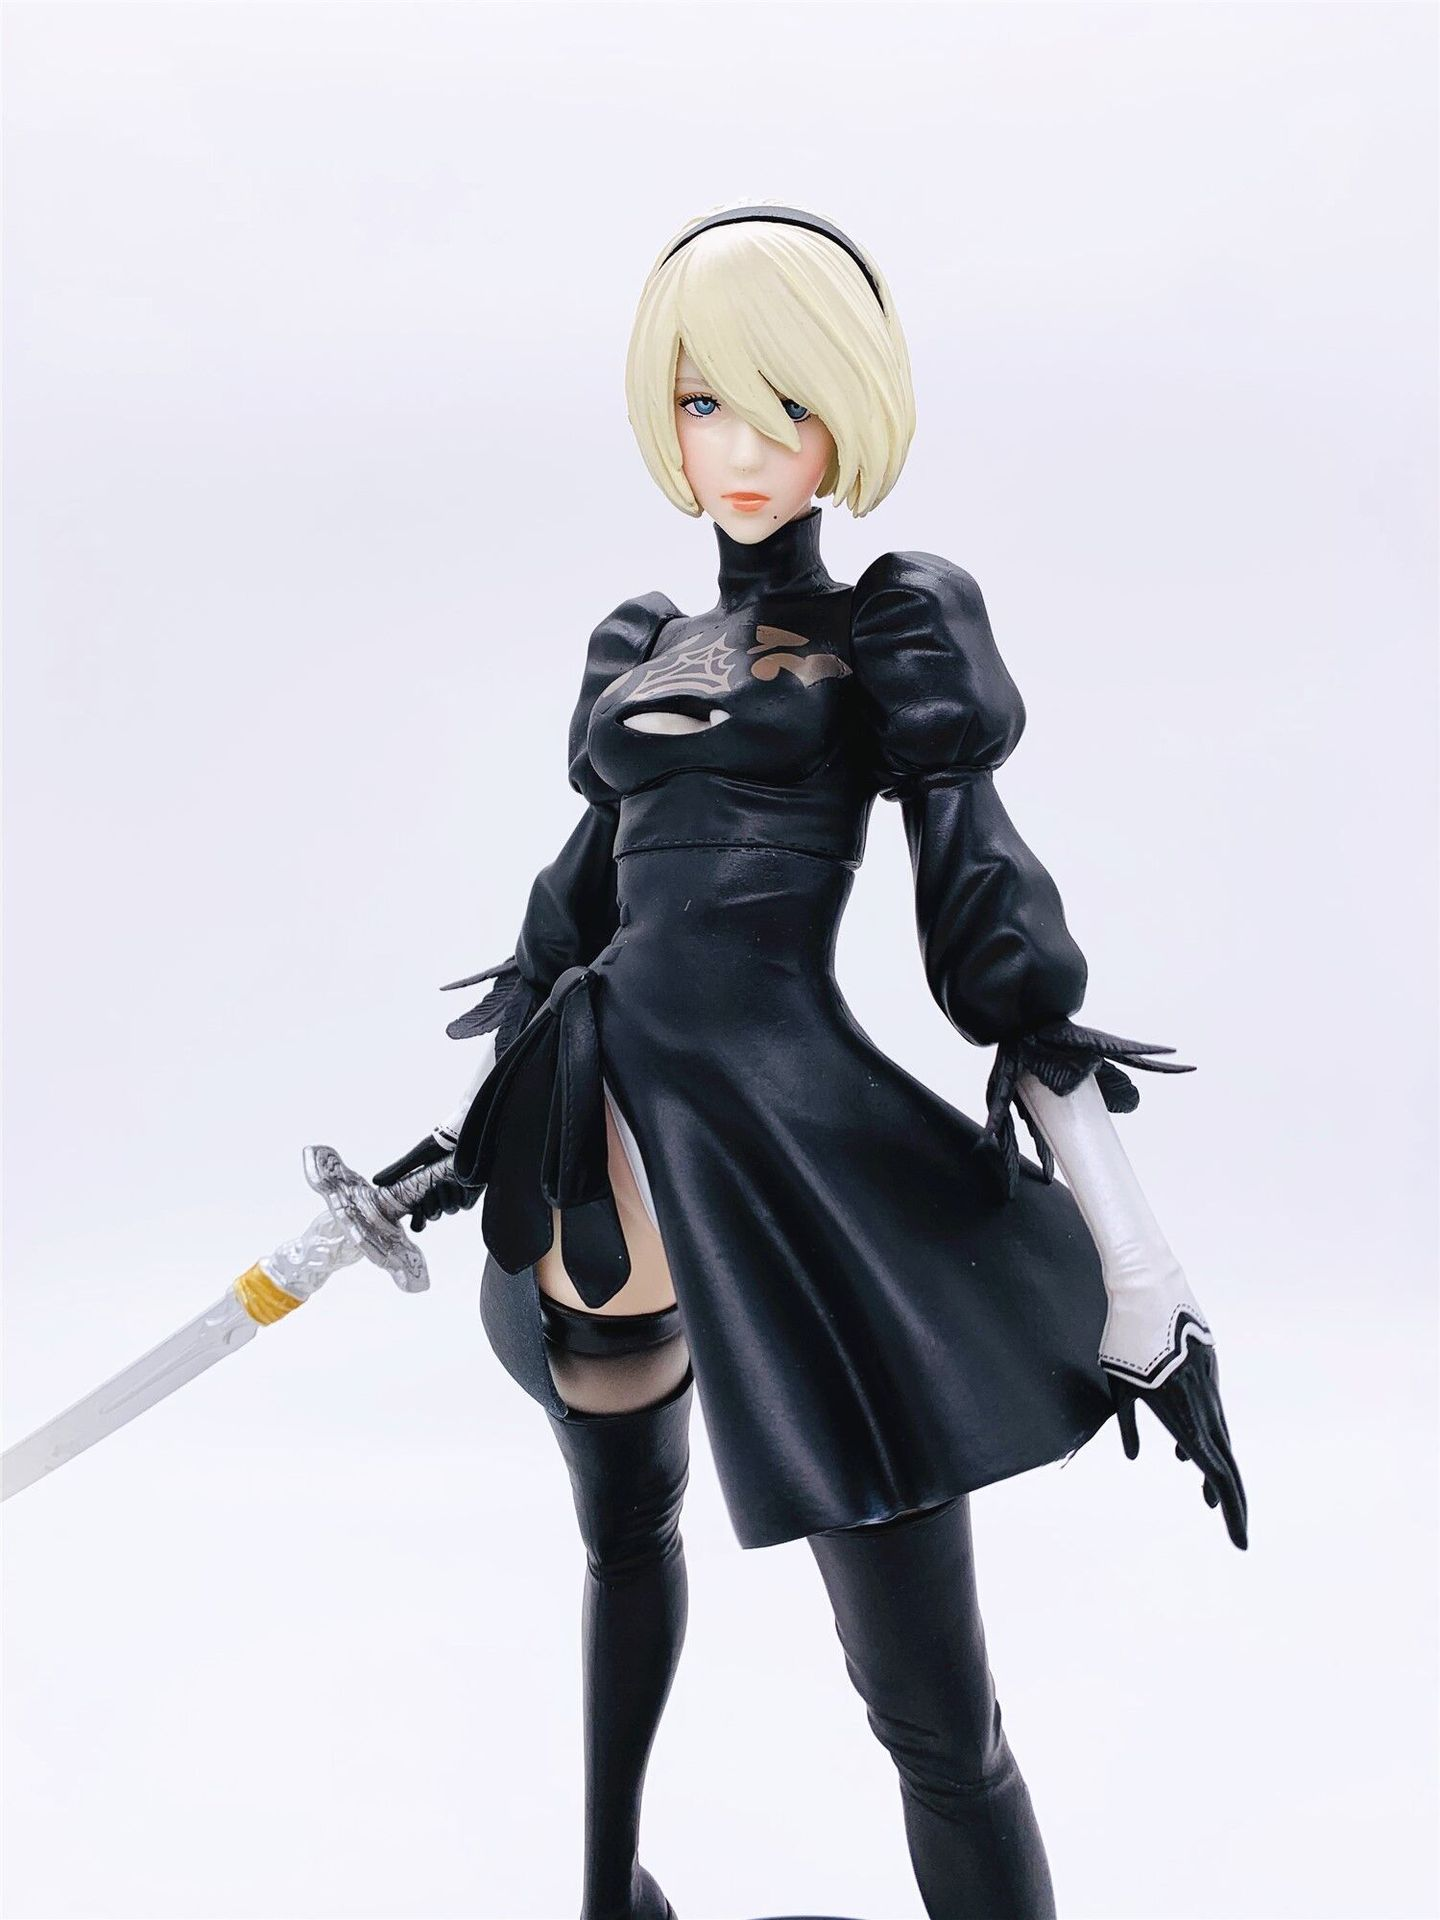 Anime Game NieR: Automata 2b YoRHa No.2 Type B PVC Action Figure Cartoon Model Collectible Toys Doll Lelakaya Dropshipping 30CM